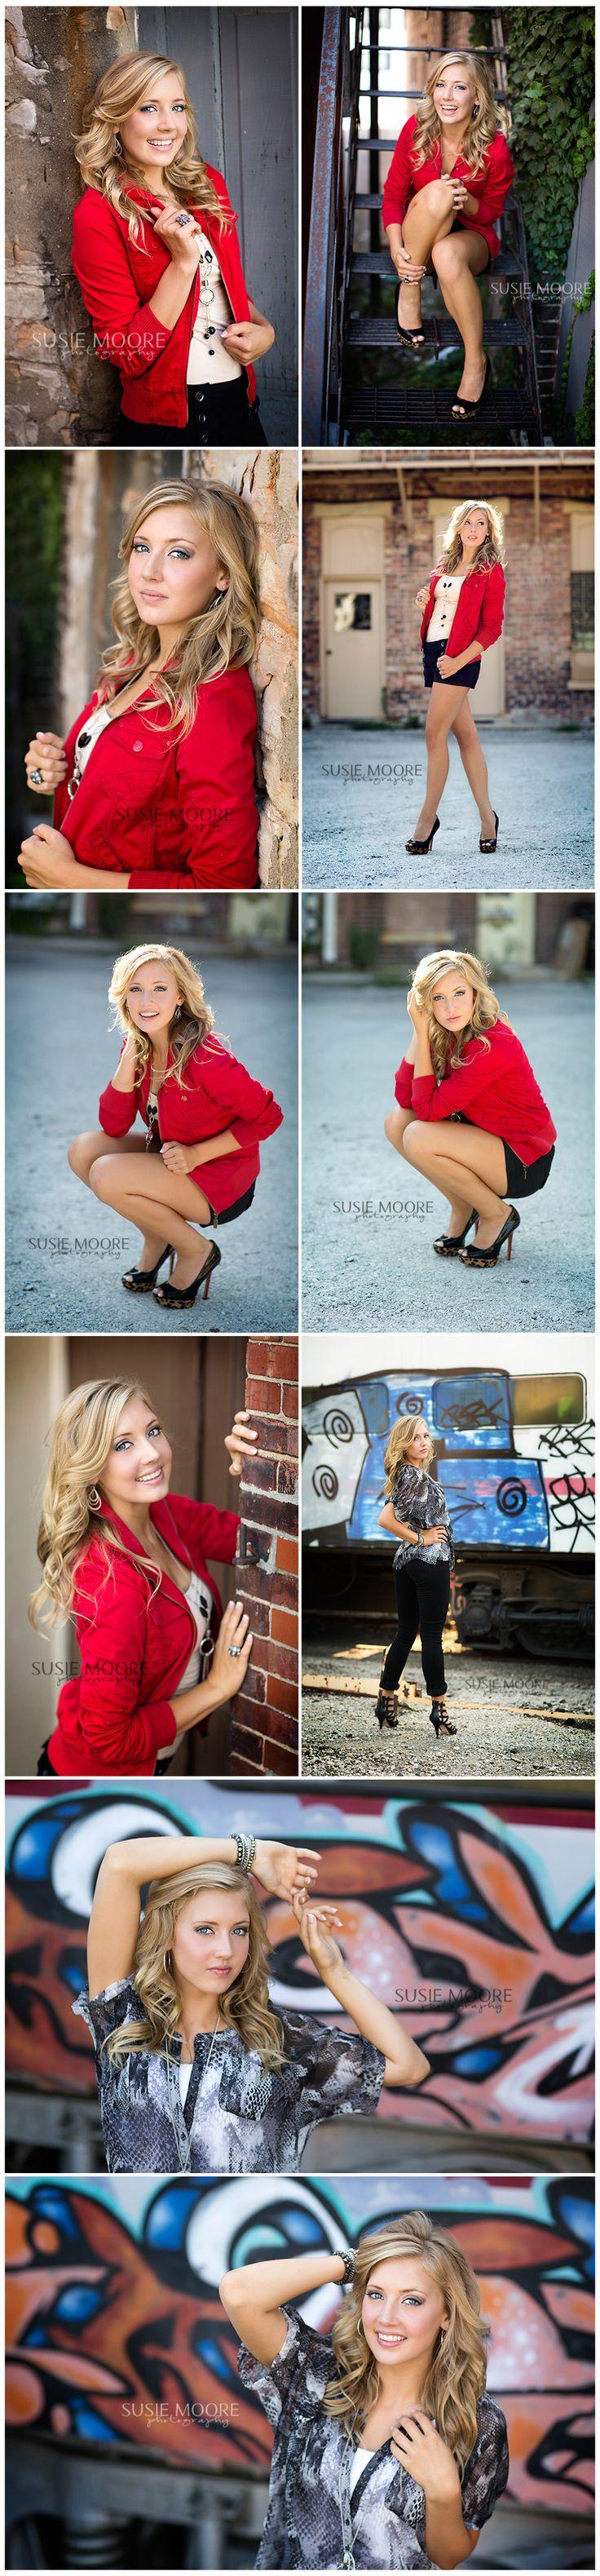 Senior Girl |Susie Moore Photography